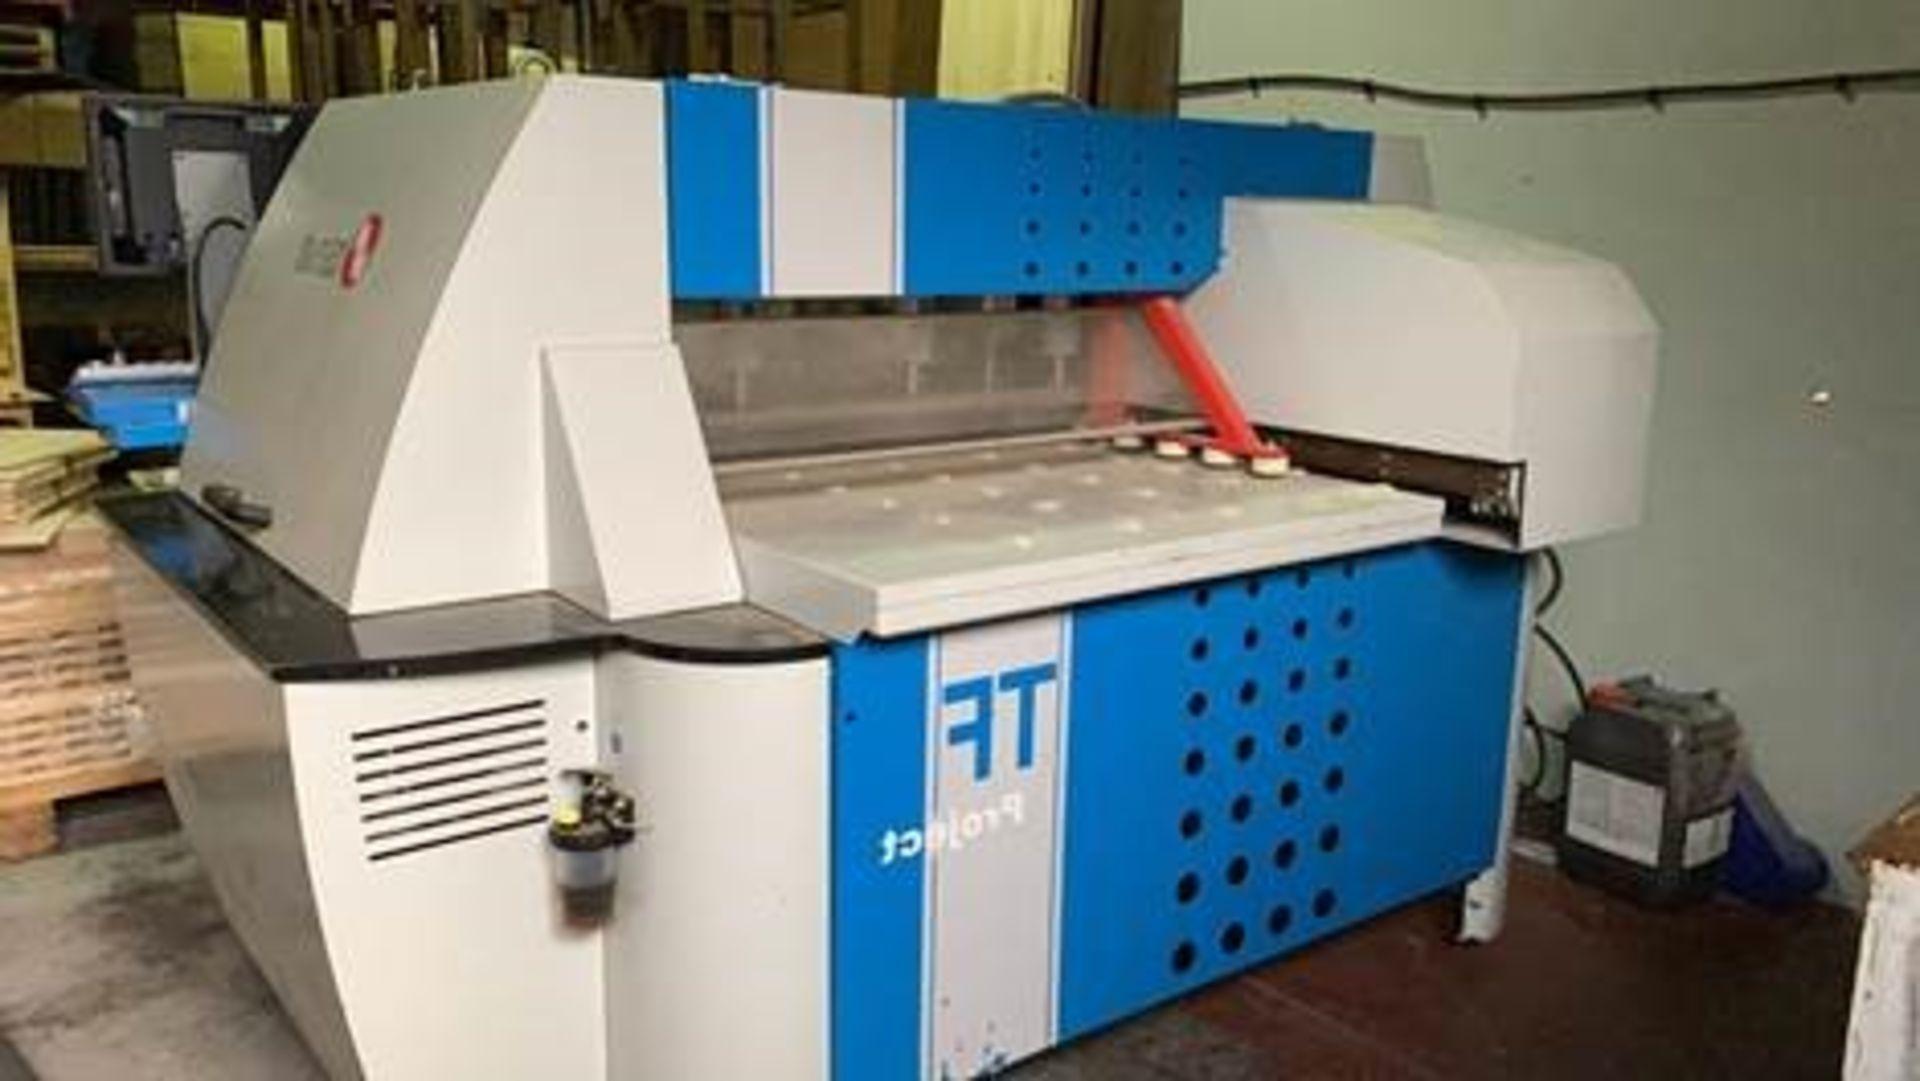 2010 Masterwood Project TF100 CNC Machine Centre - Image 3 of 7